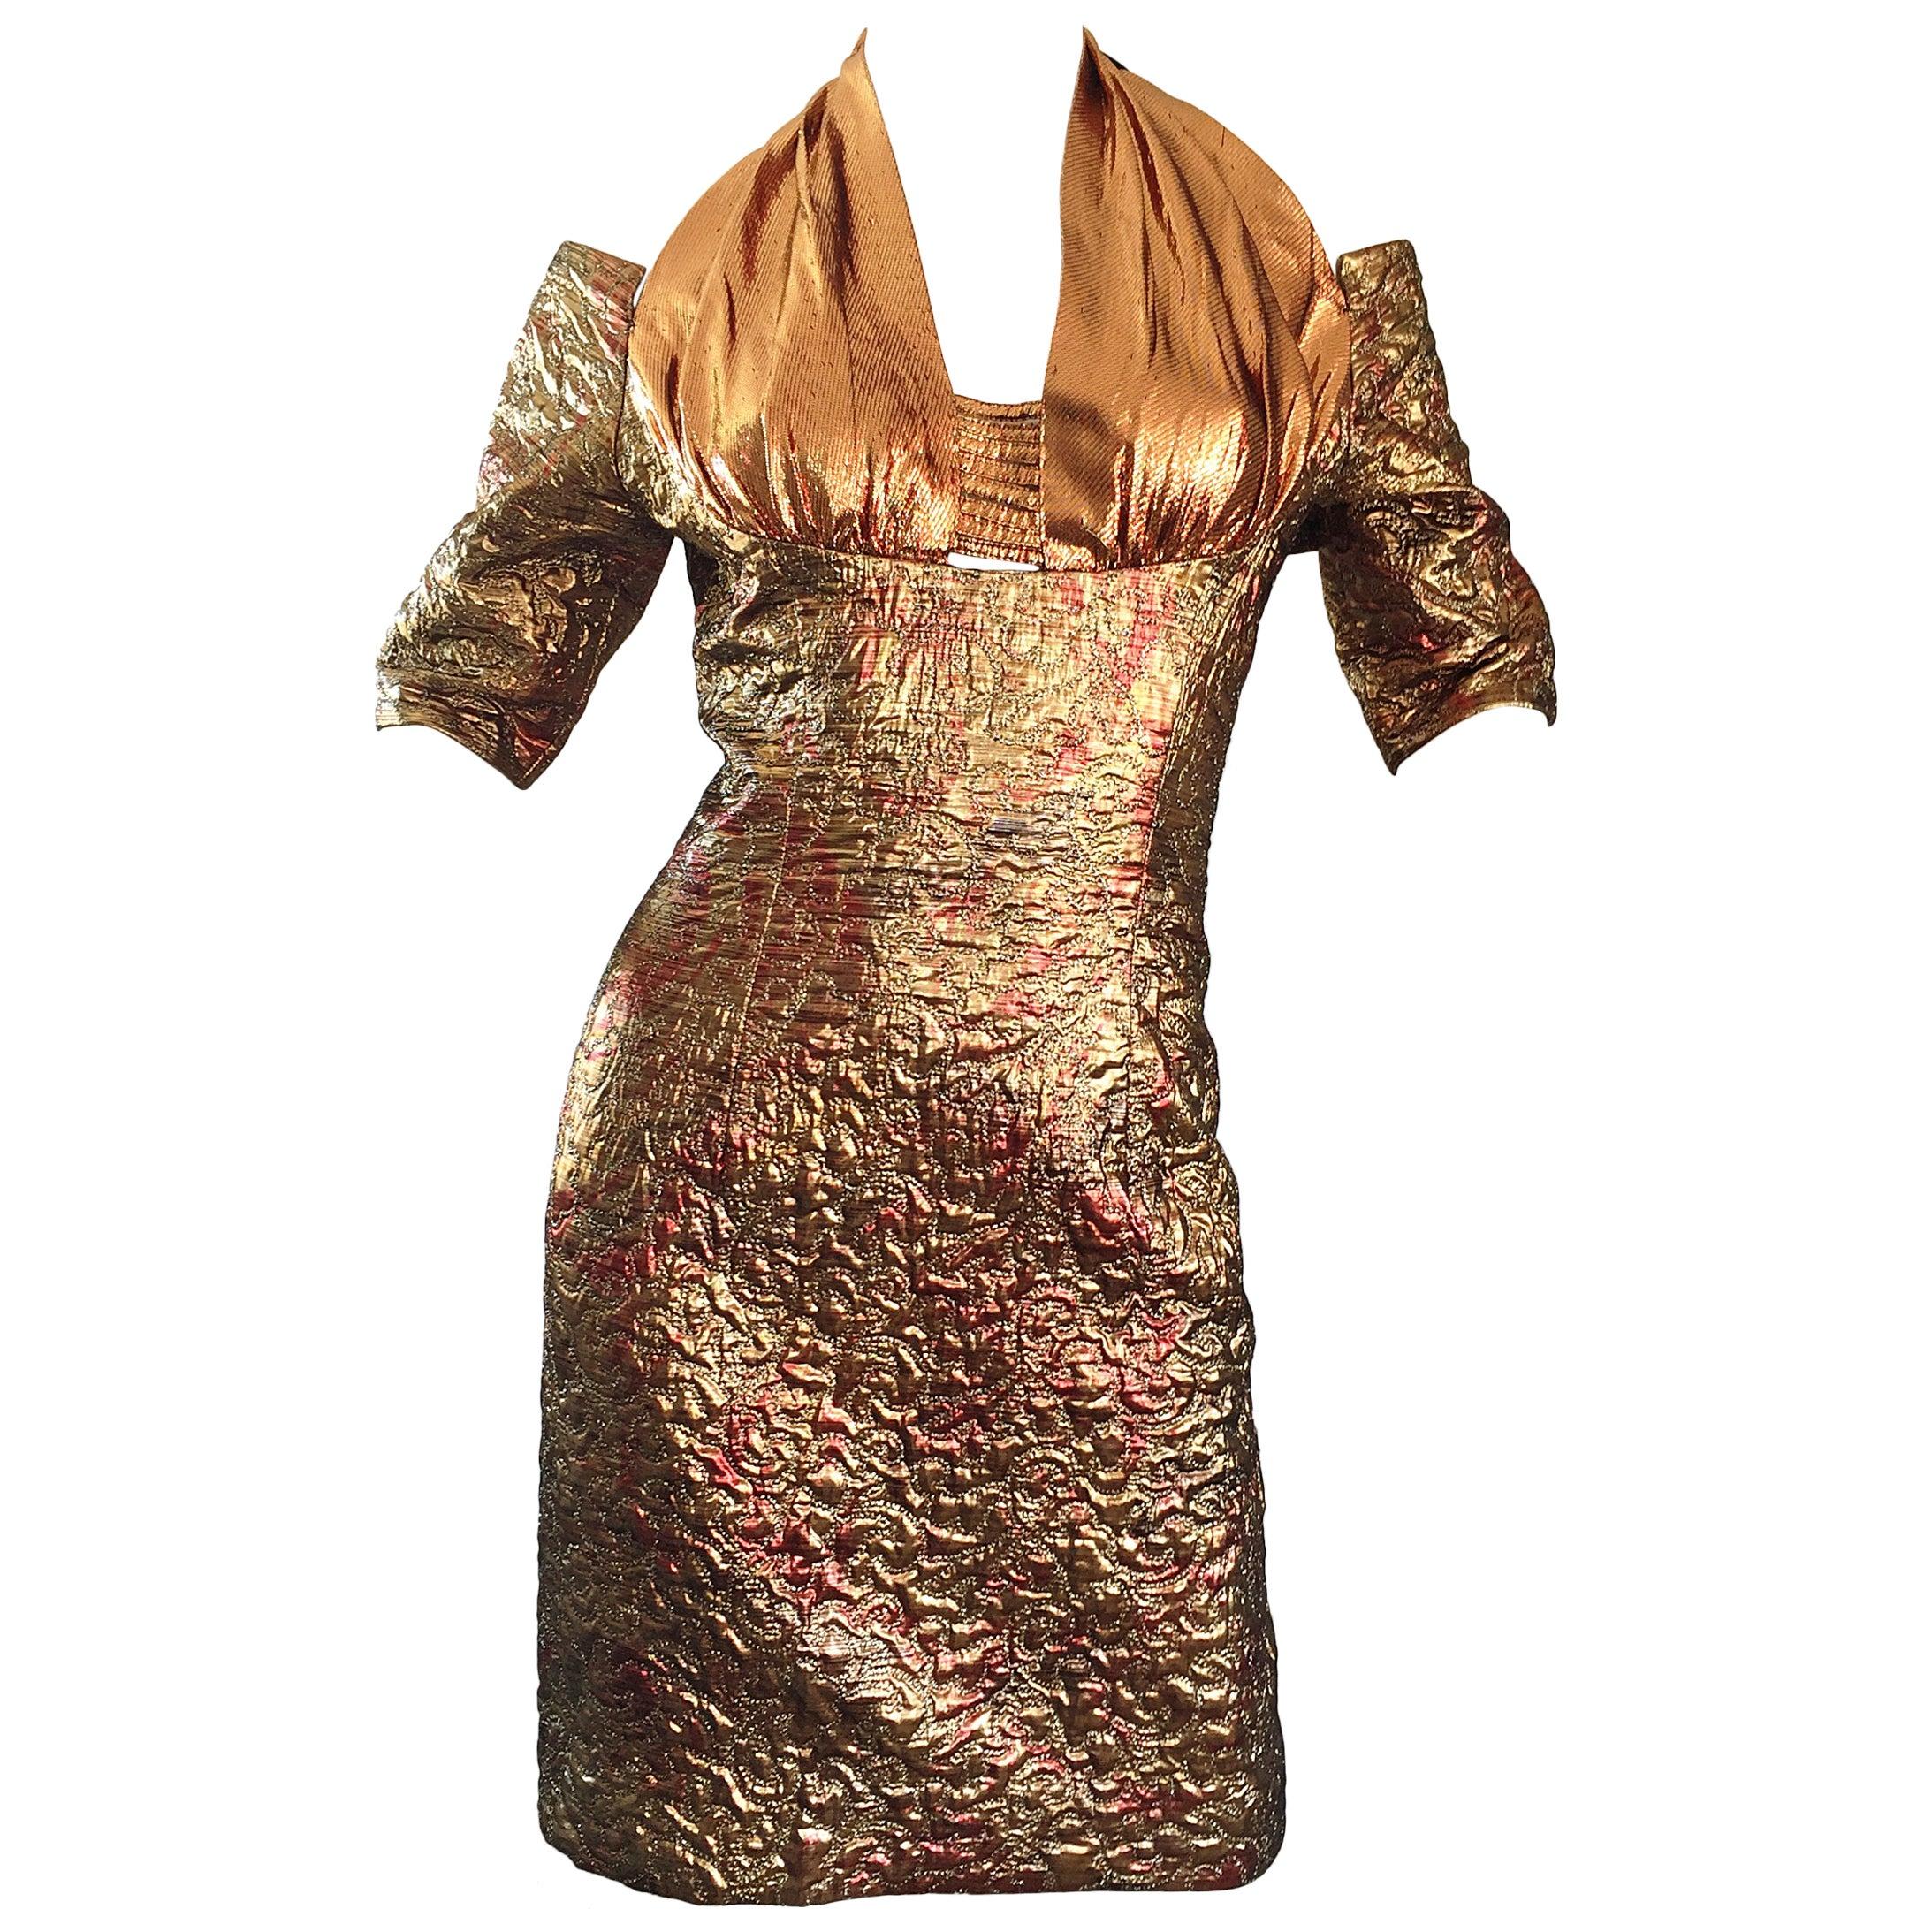 Sexy 1990s Bronze + Gold + Rose Gold Silk Brocade Vintage Halter Bod Con Dress